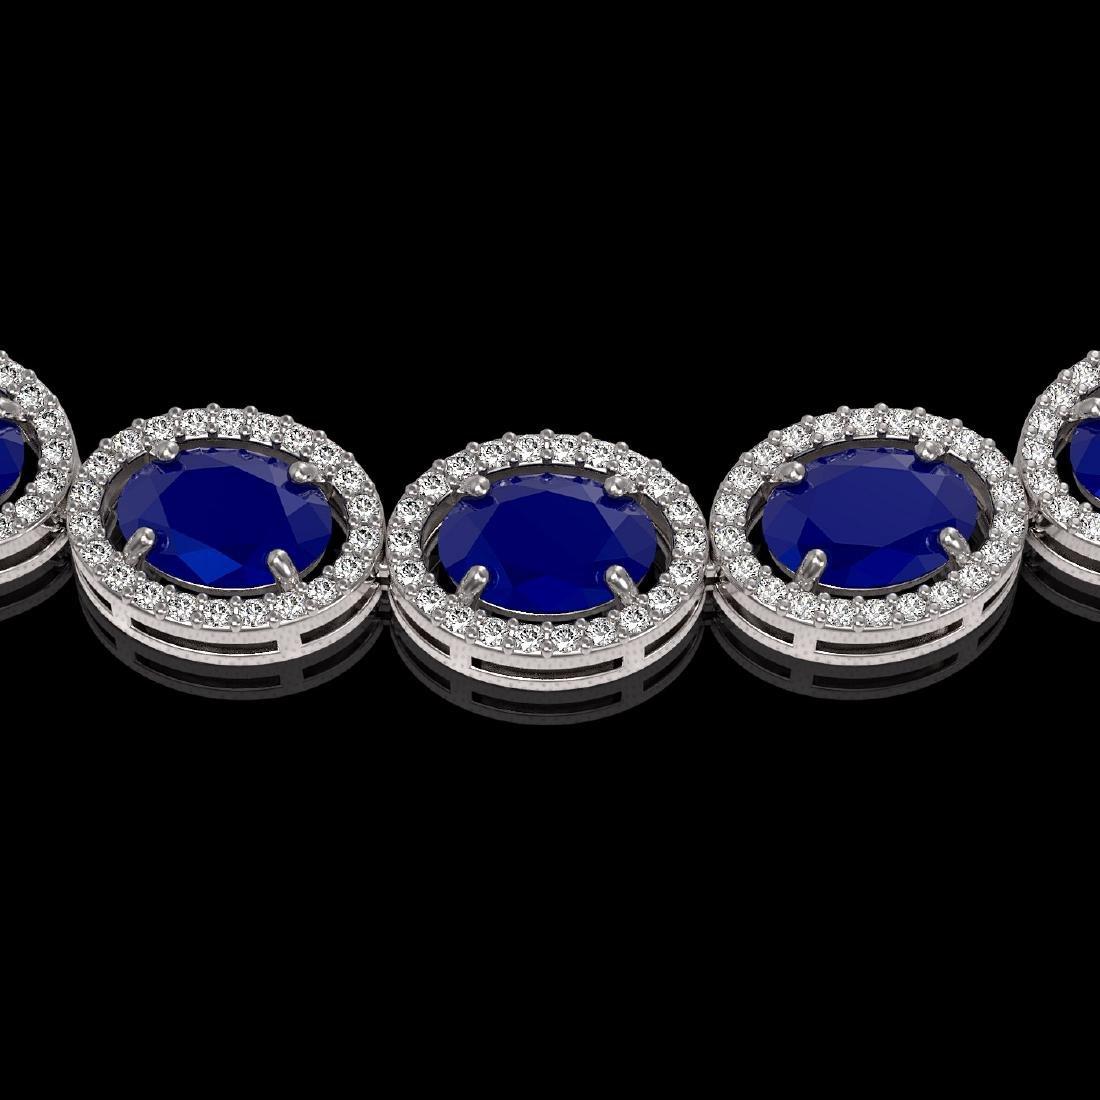 52.15 CTW Sapphire & Diamond Halo Necklace 10K White - 3